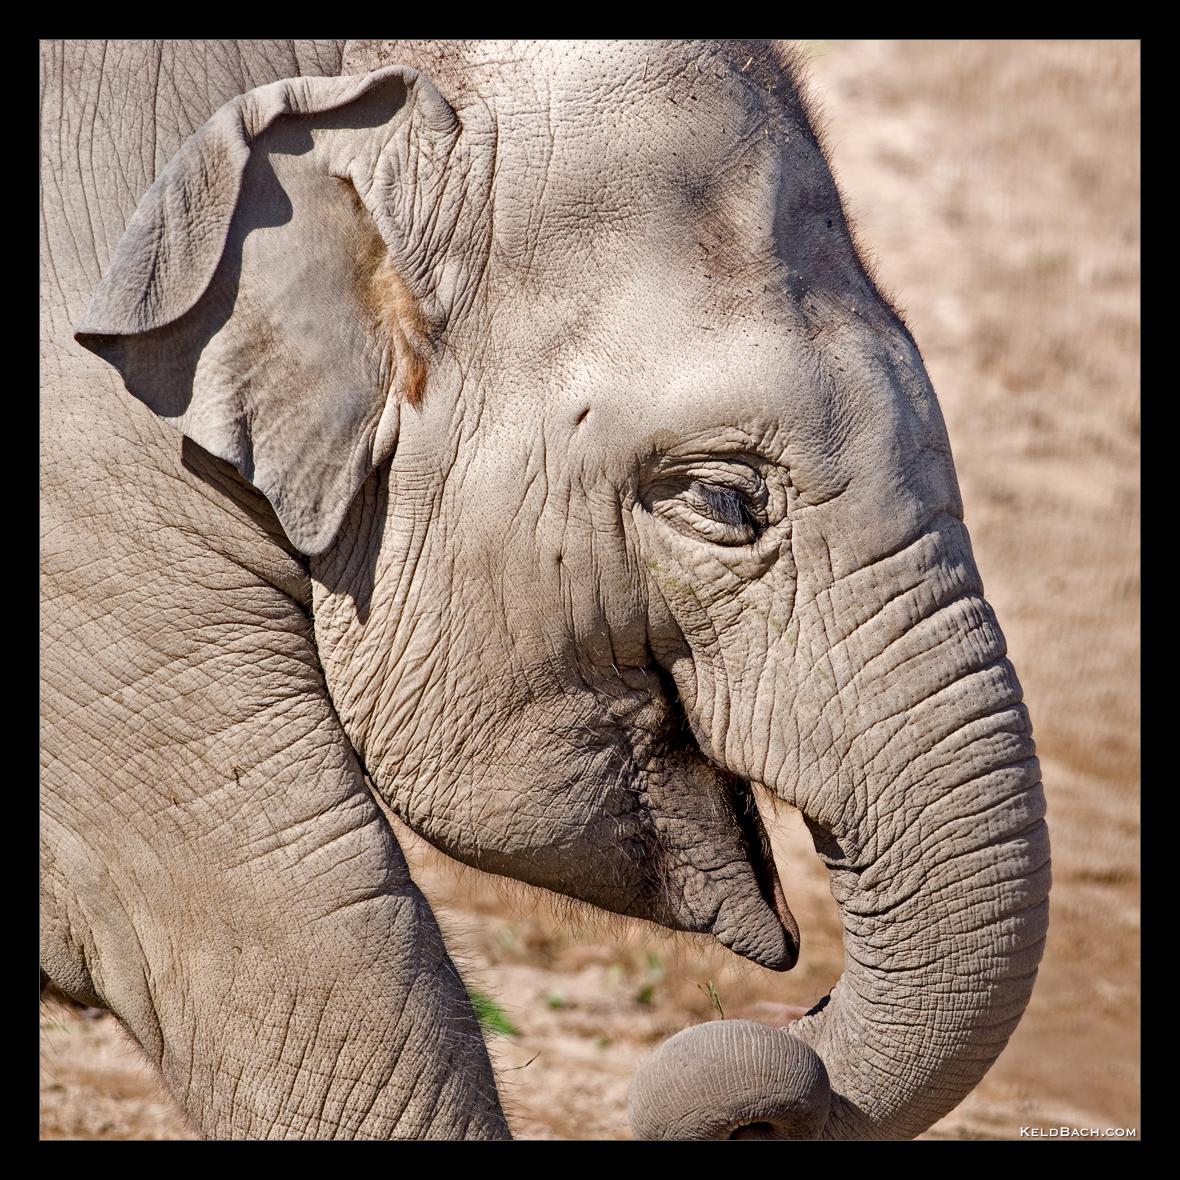 Baby Elephant Walk by KeldBach